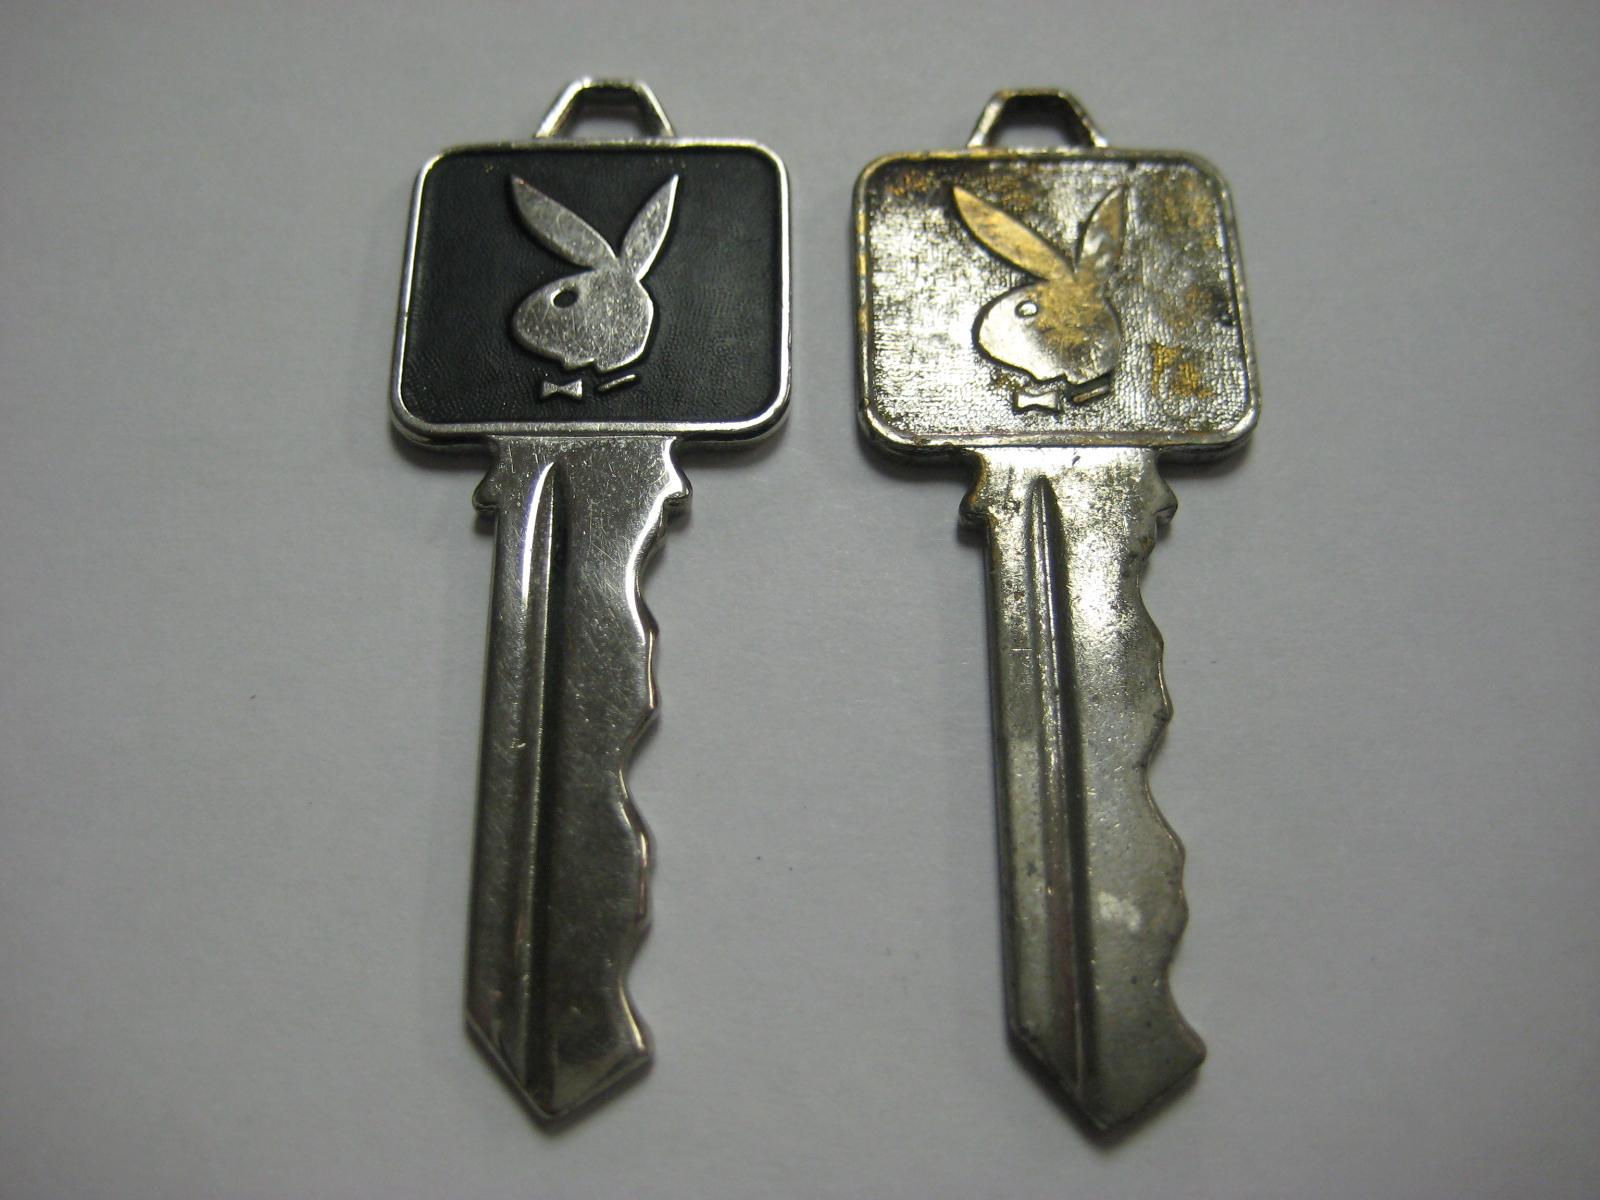 Boston Playboy Club Keys